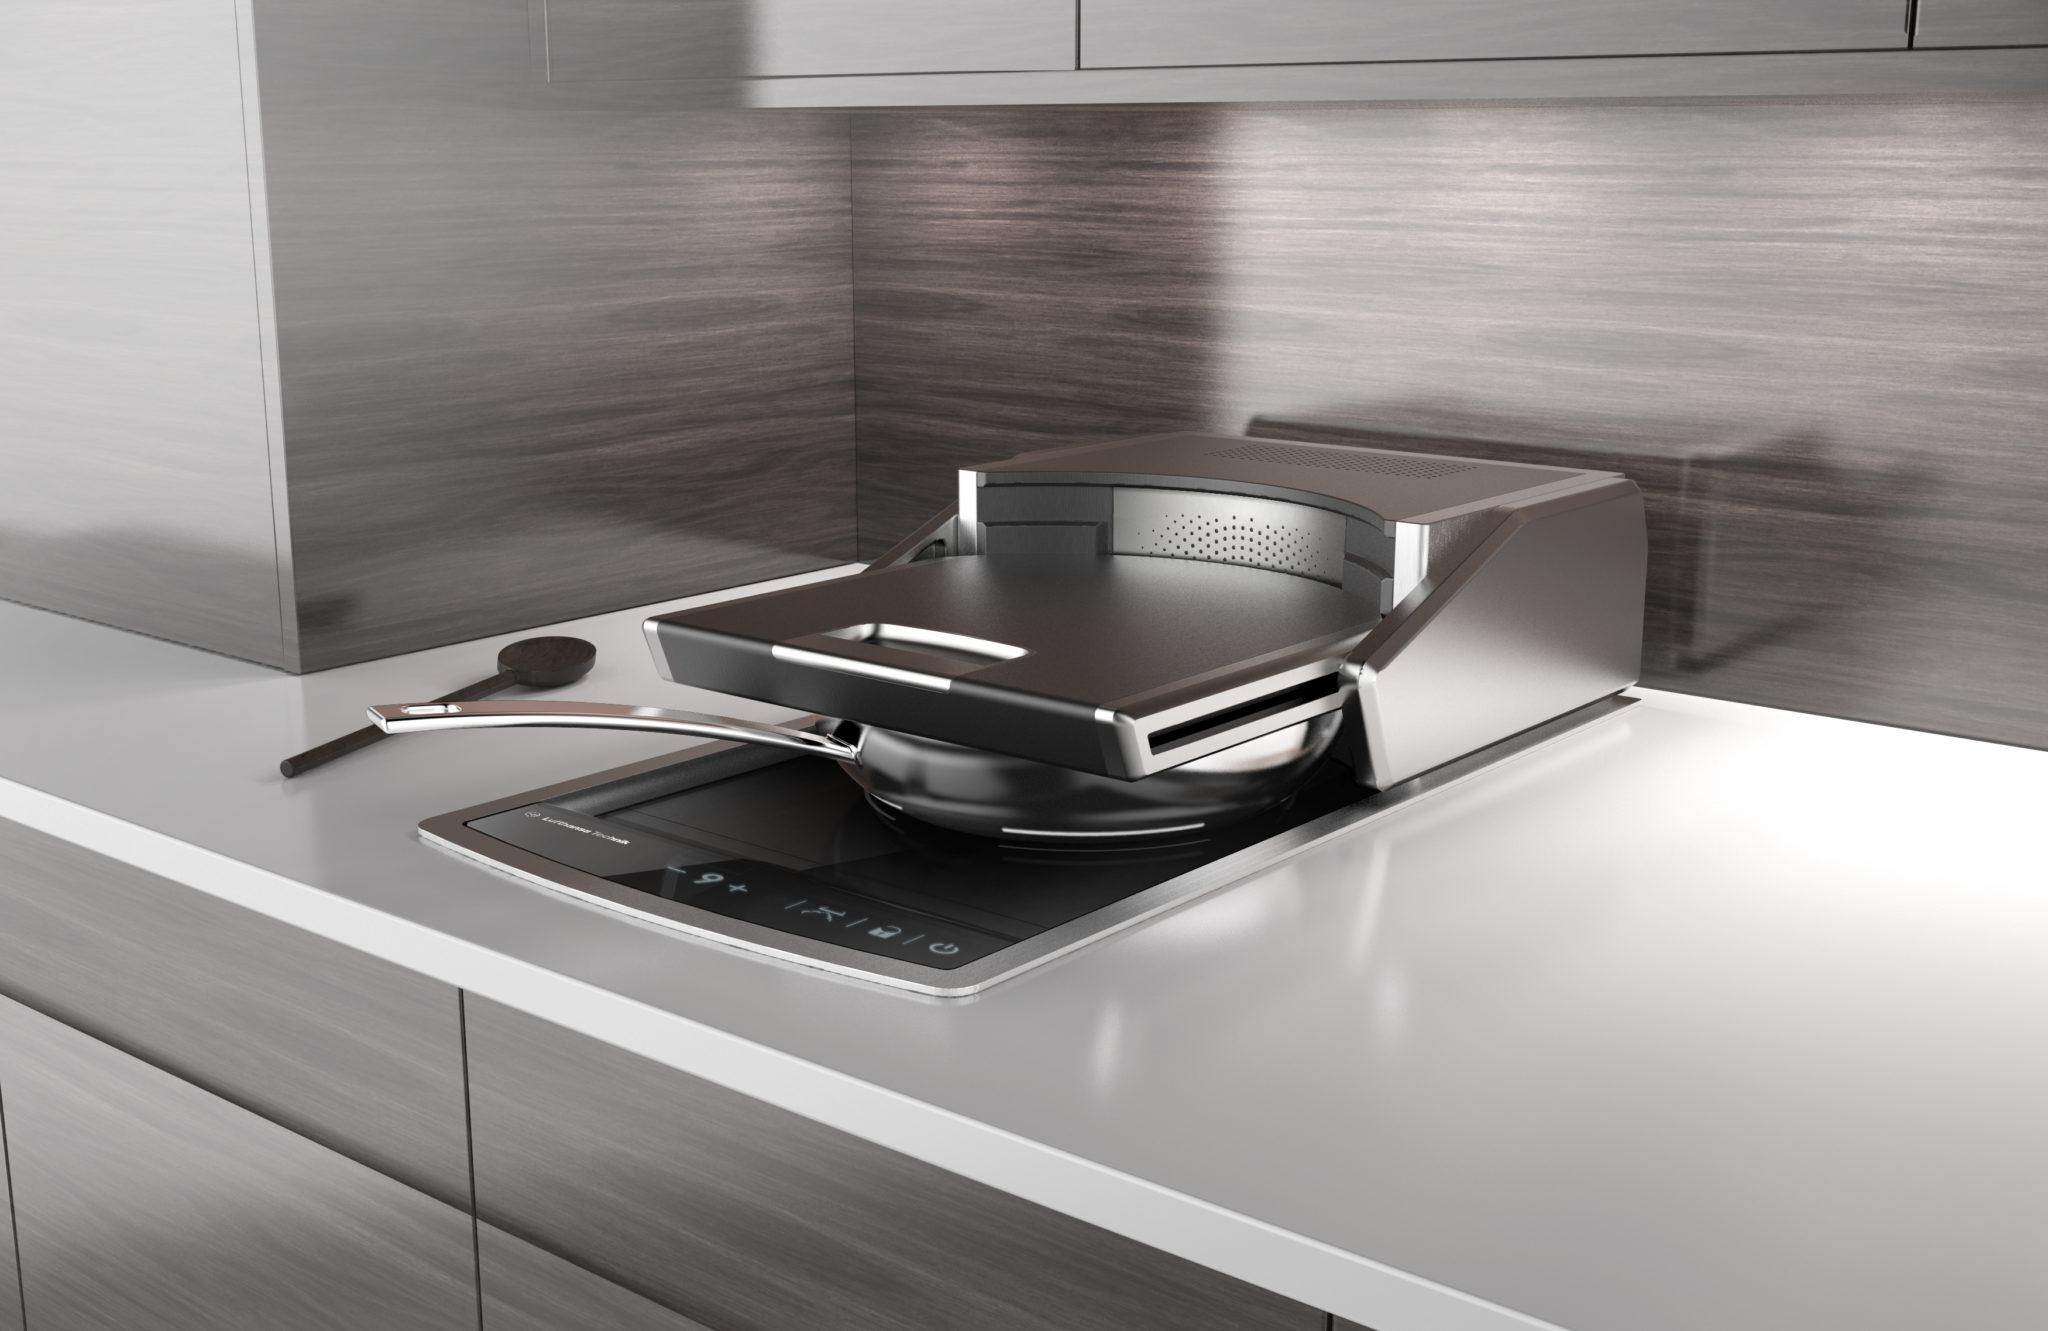 LHT Inductive Cooking Platform